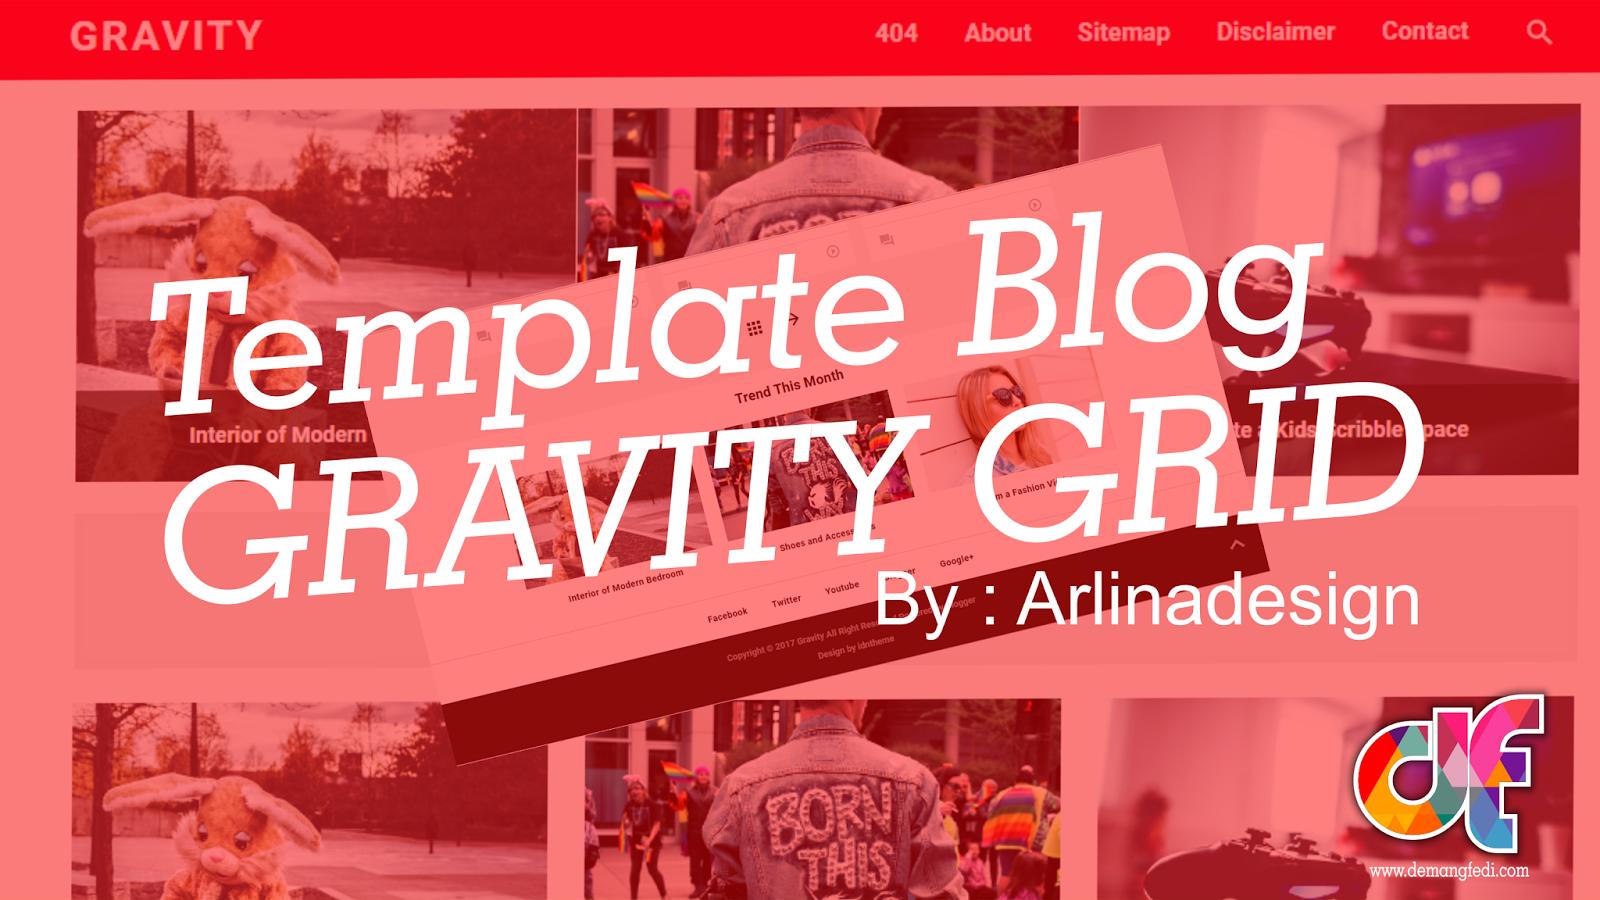 Template Blog Gravity Responsive